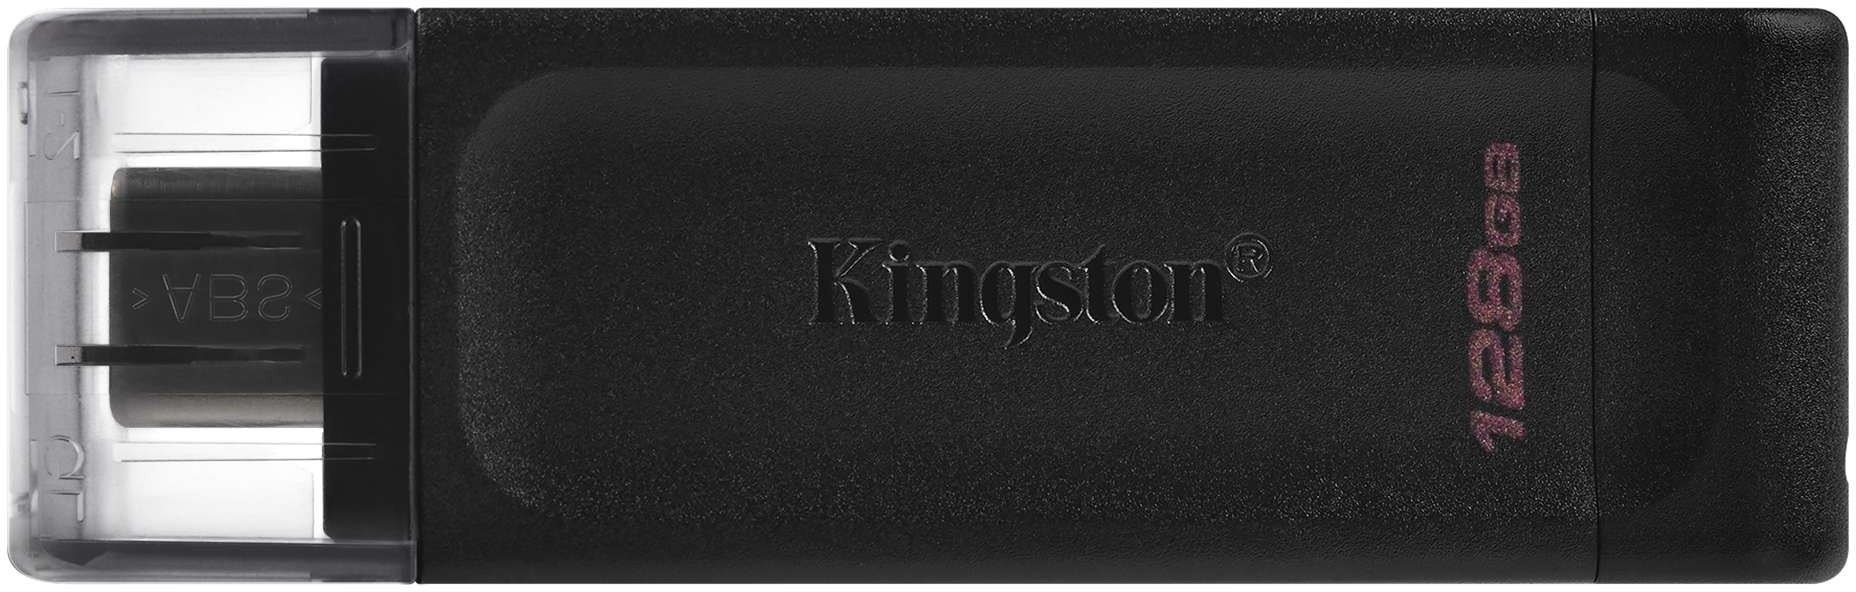 Флэш-накопитель Kingston DataTraveler 70 [DT70/128GB] 128 Гб